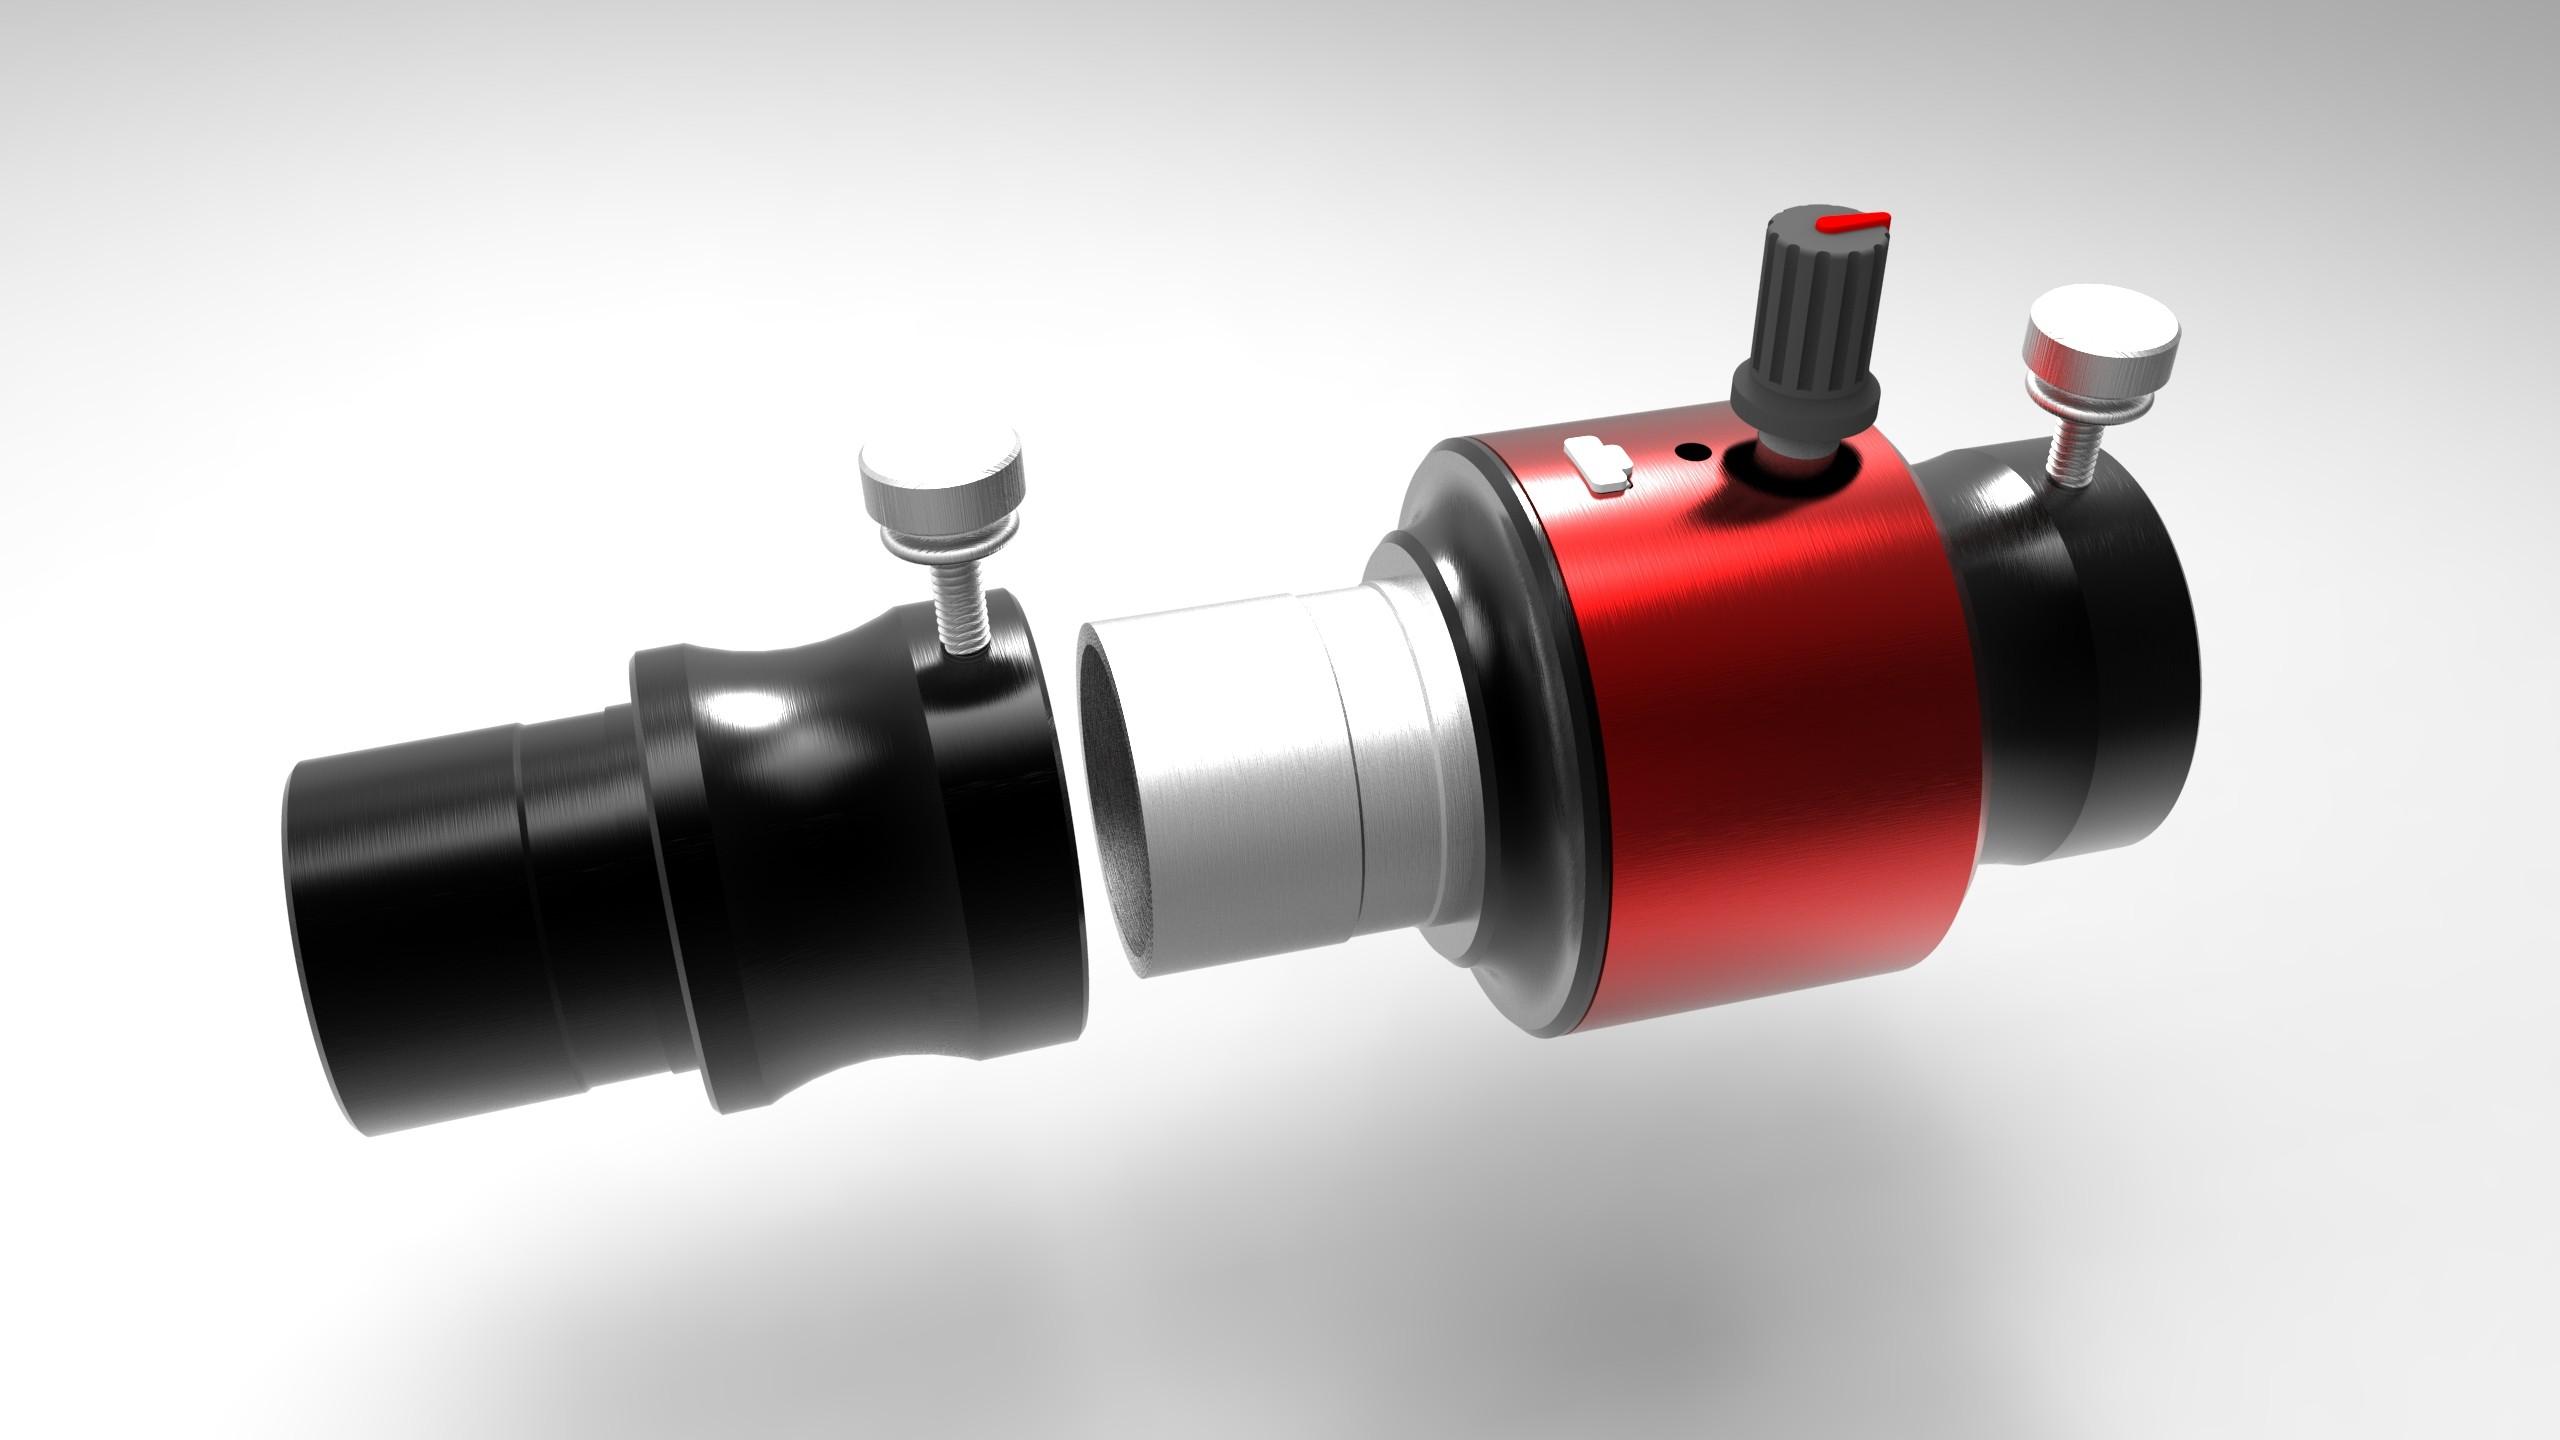 Daystar Instruments COMBO QUARK CHROMOSPHERE Filter